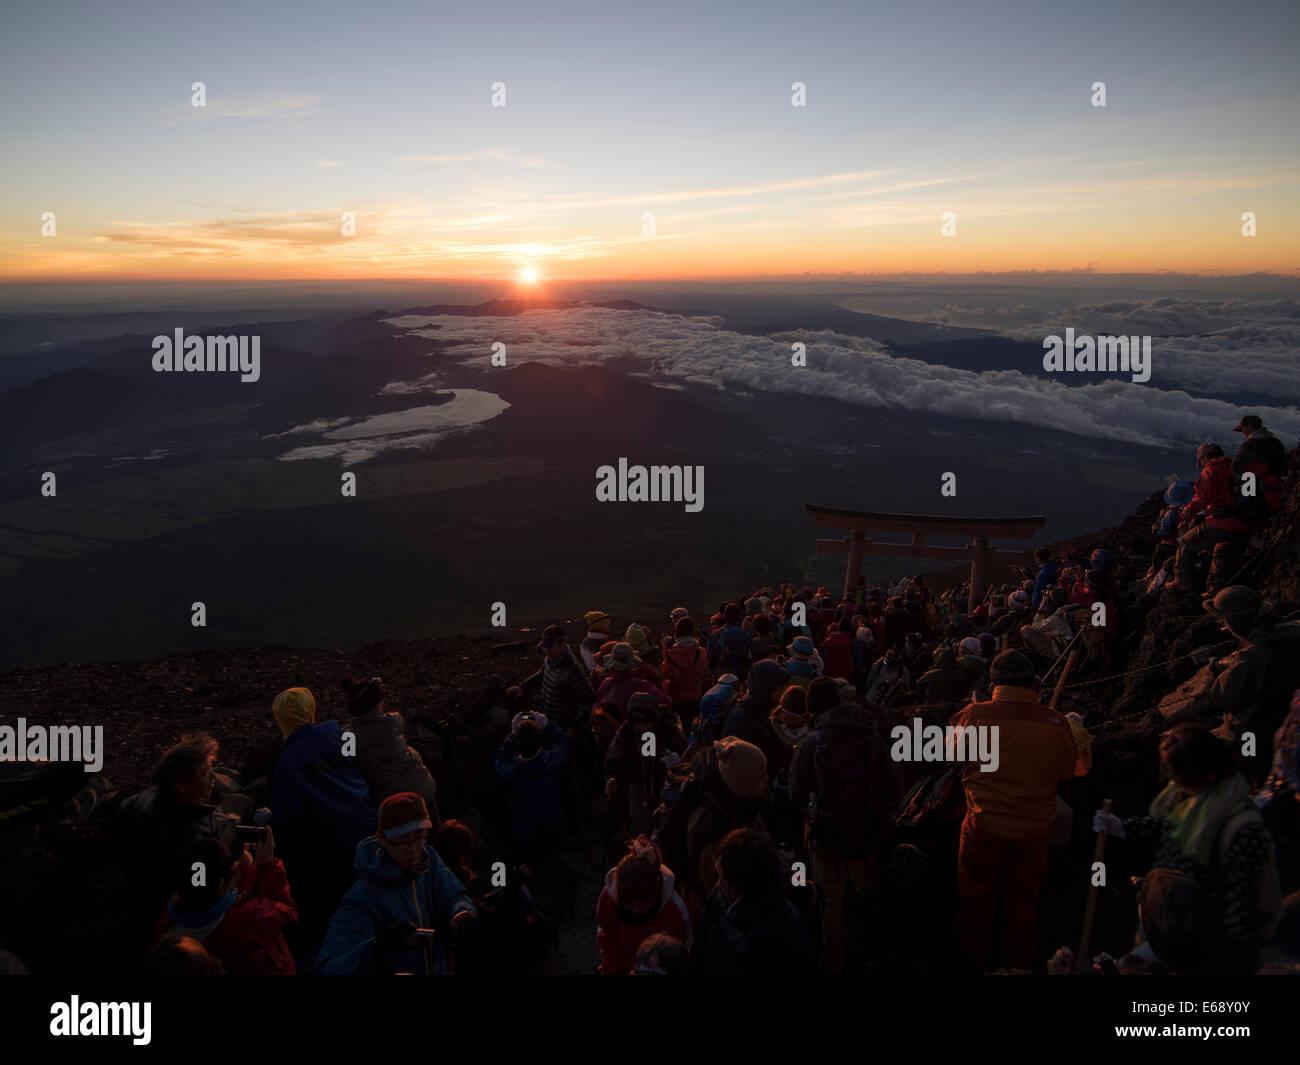 Staffel 1 2014 Stockfotos & Staffel 1 2014 Bilder - Alamy